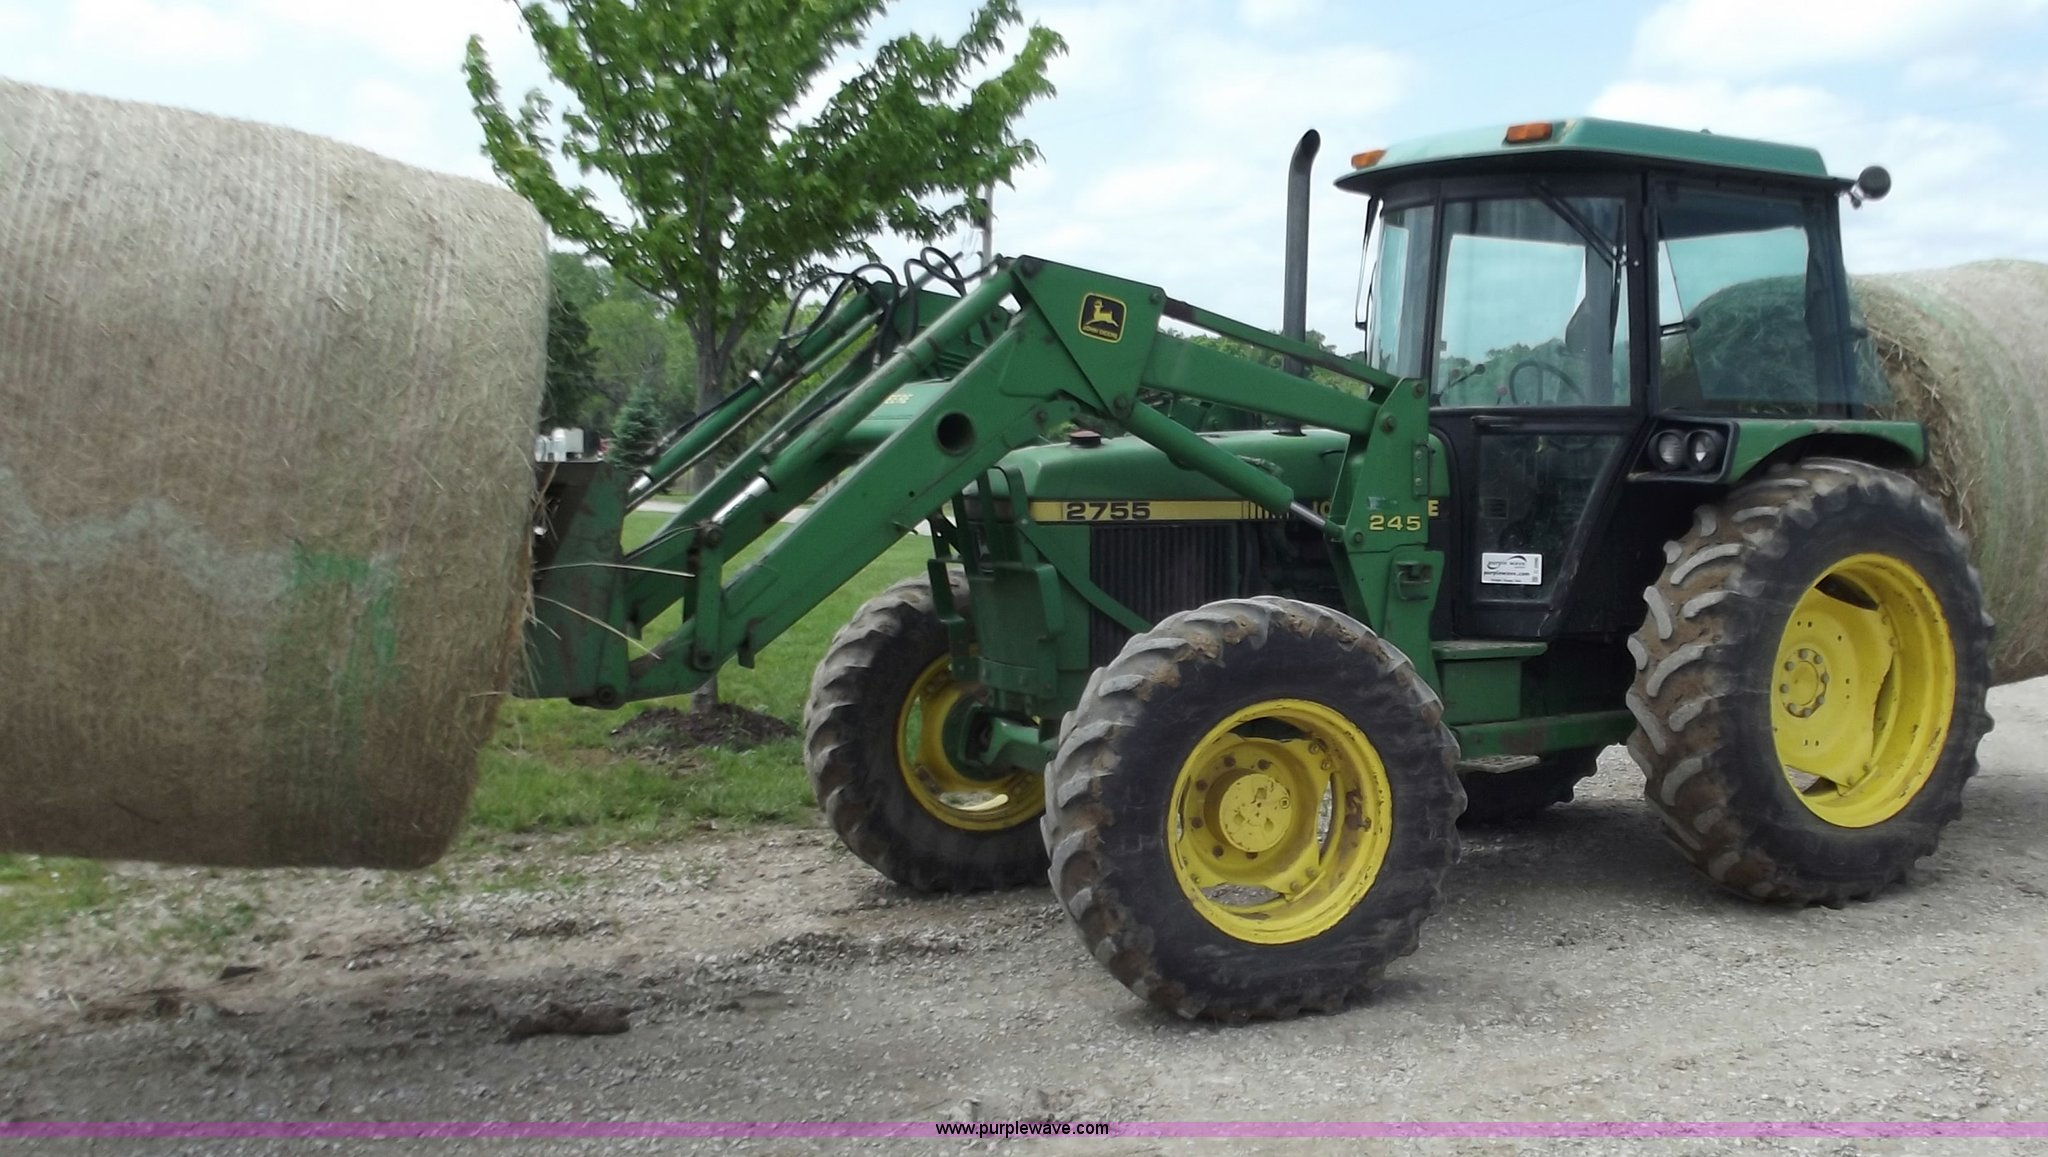 C2096 image for item C2096 1991 John Deere 2755 MFWD tractor ...